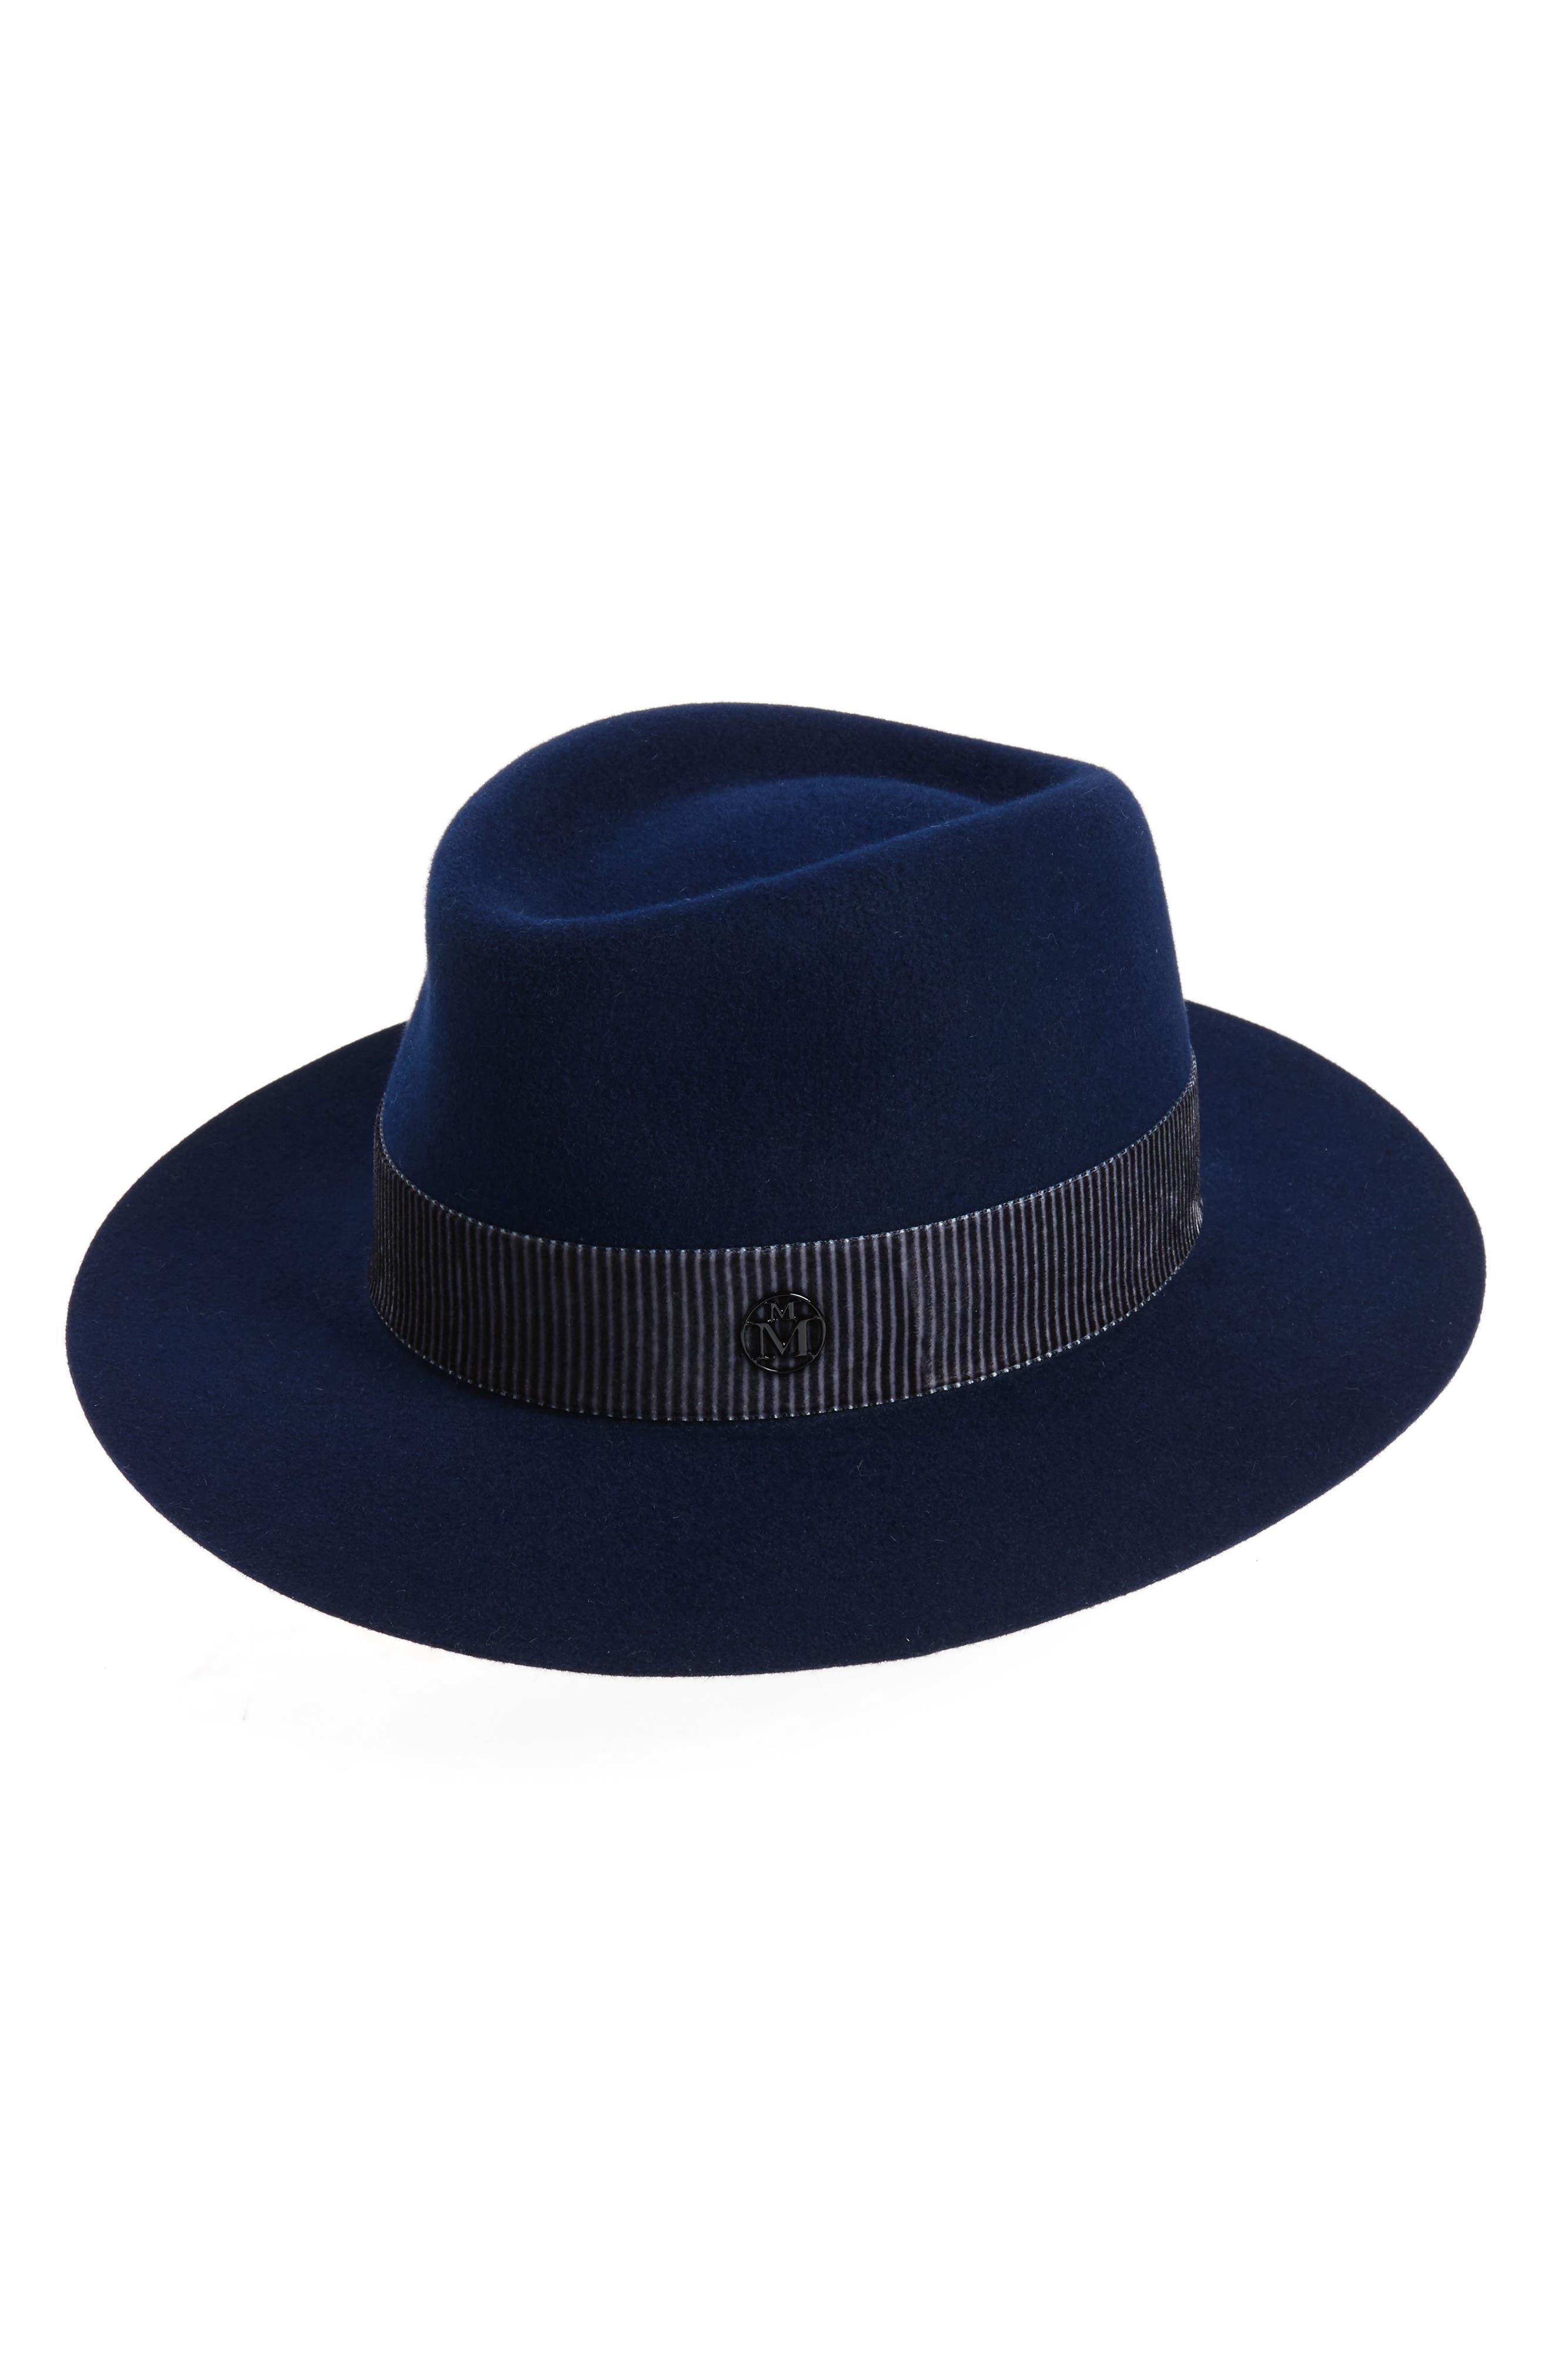 Alternate Image 1 Selected - Maison Michel Andre Fur Felt Hat